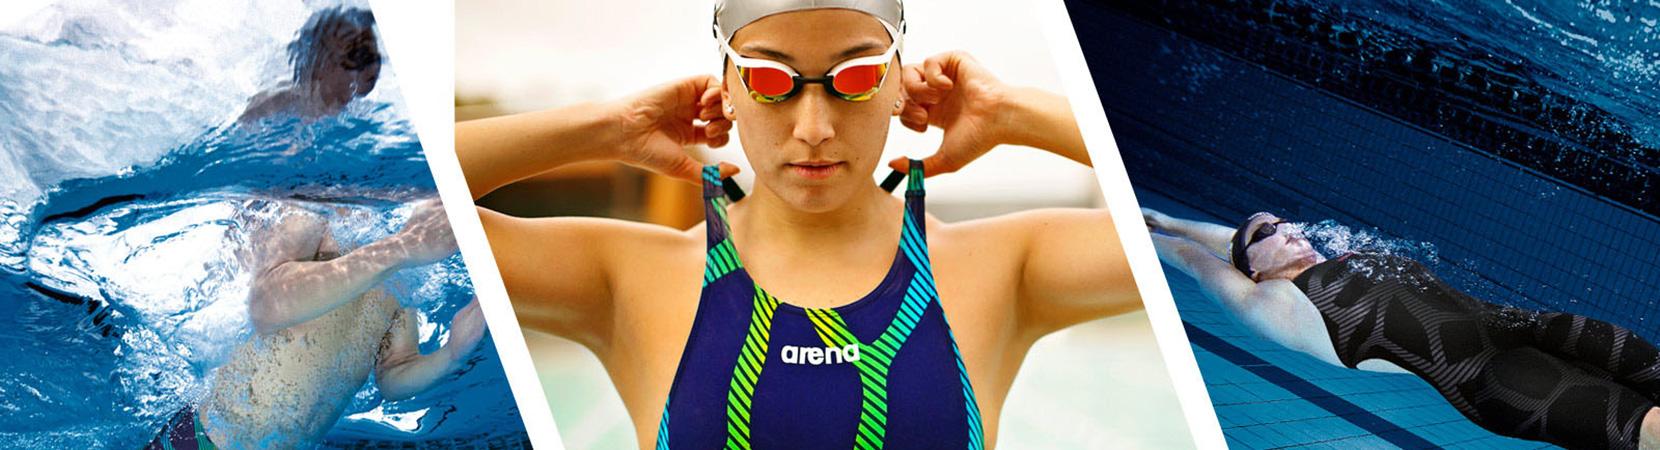 Arena swimwear line